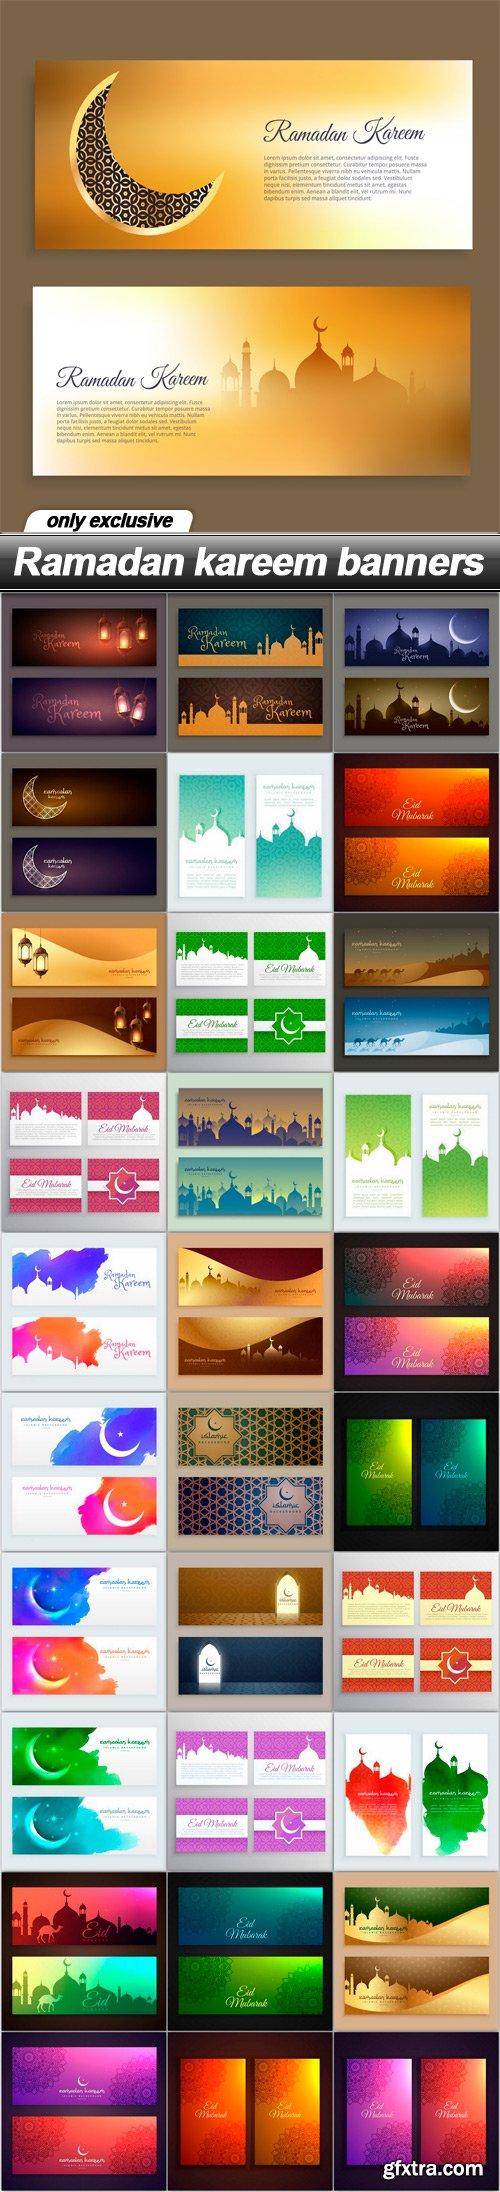 Ramadan kareem banners - 31 EPS